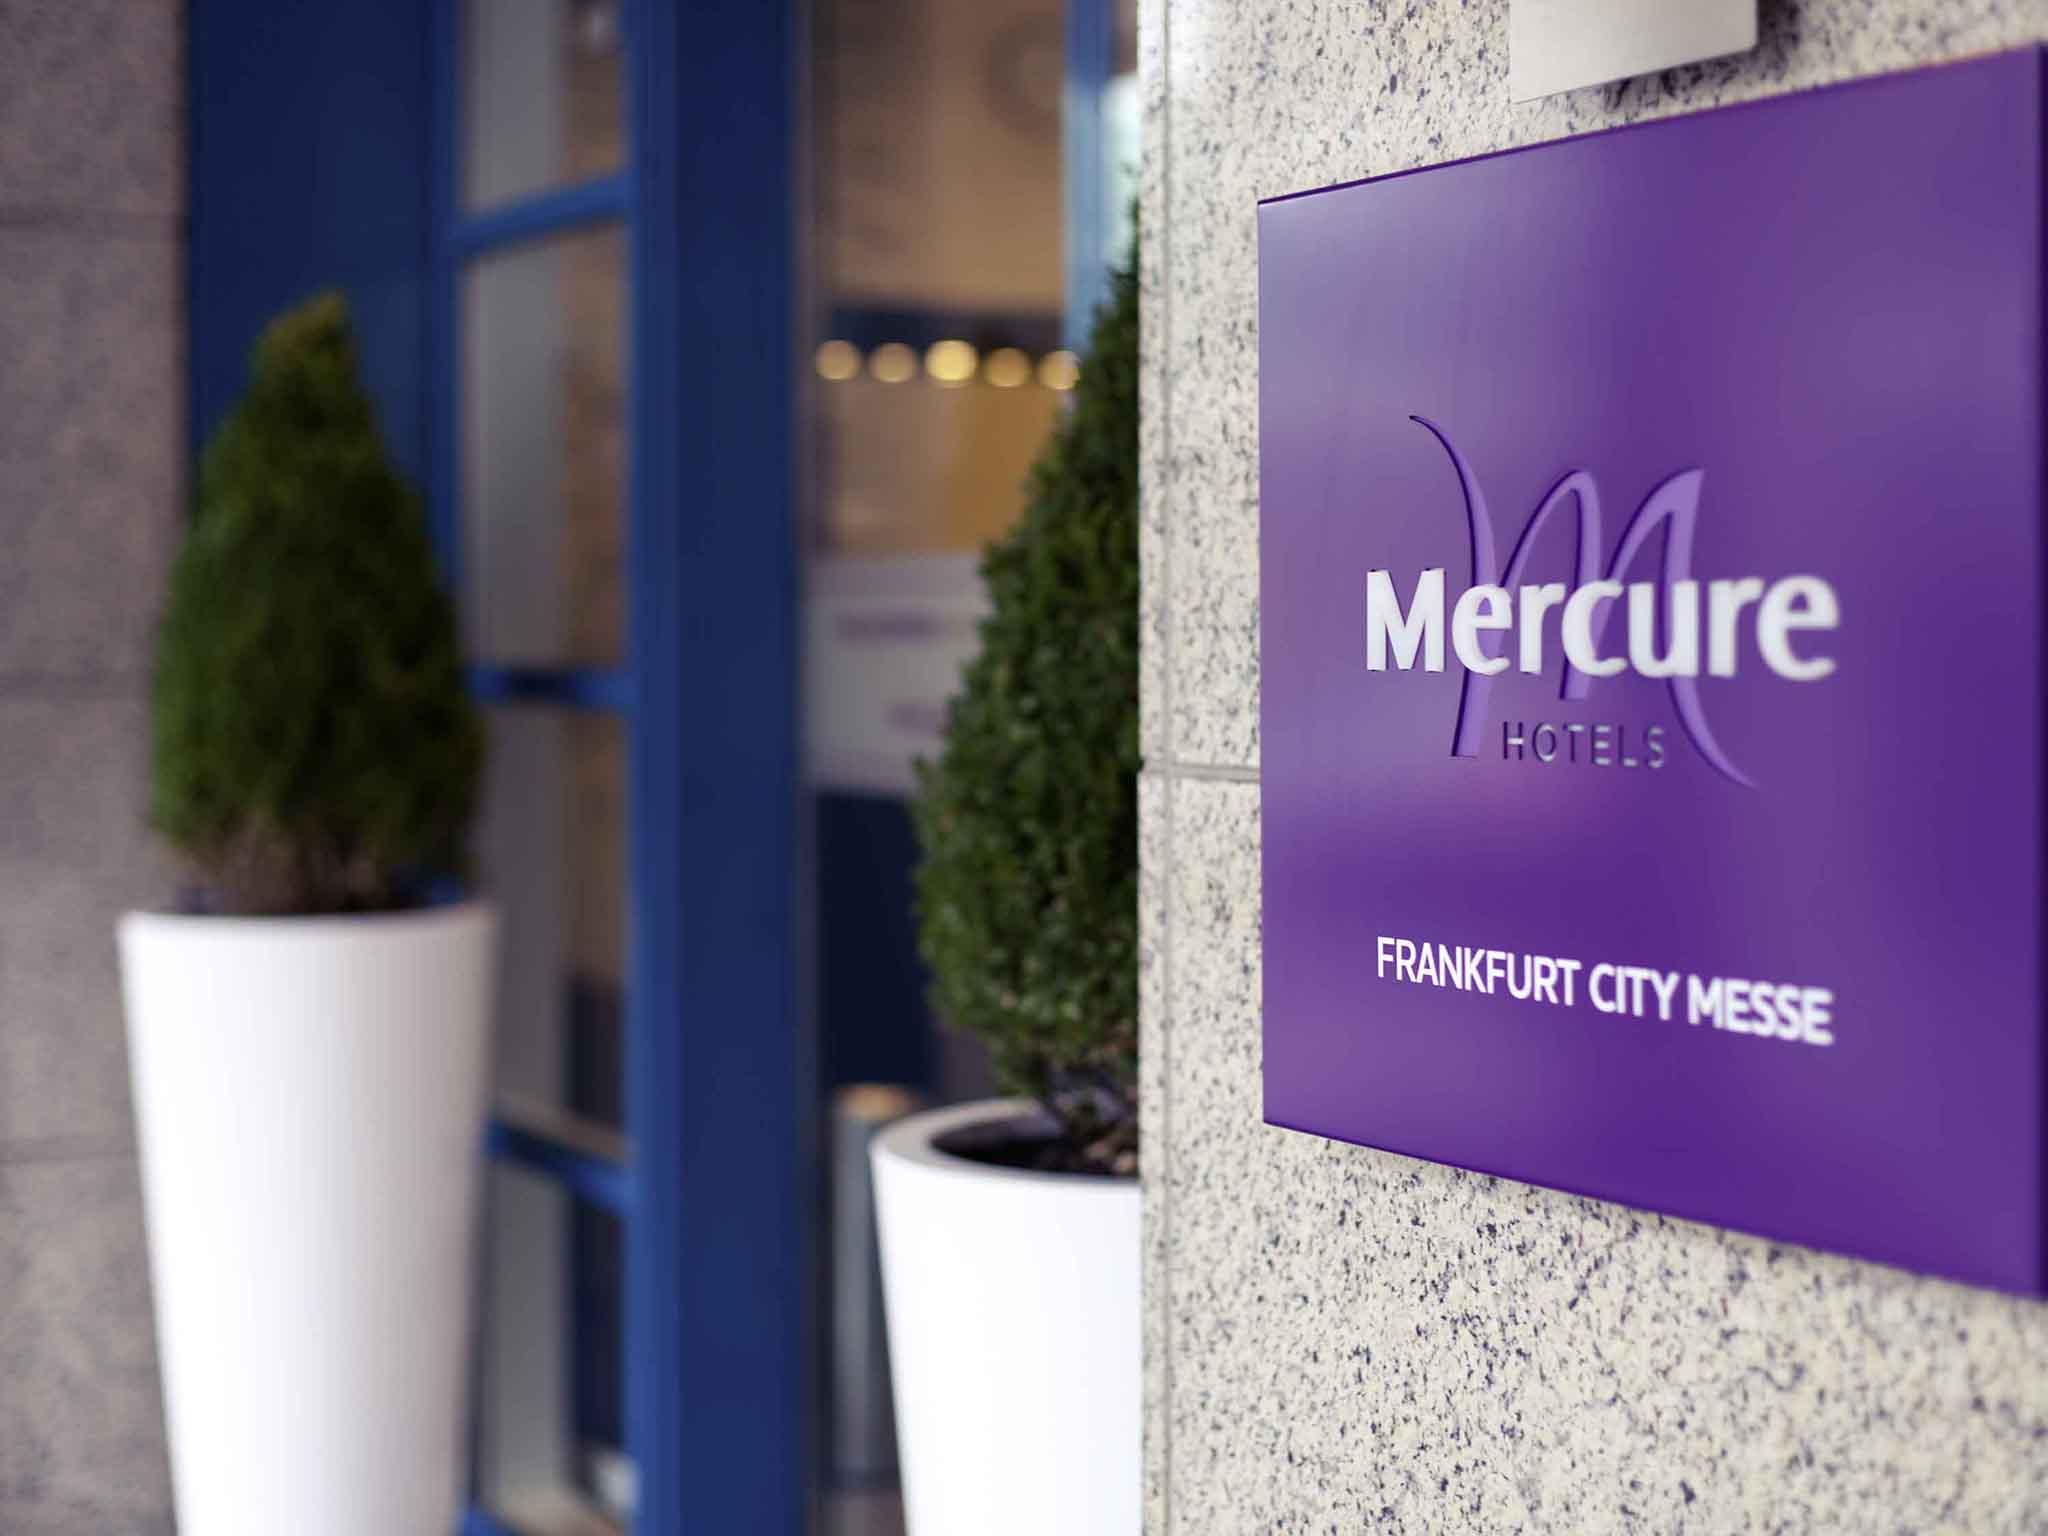 Hotel – Mercure Hotel Frankfurt City Messe